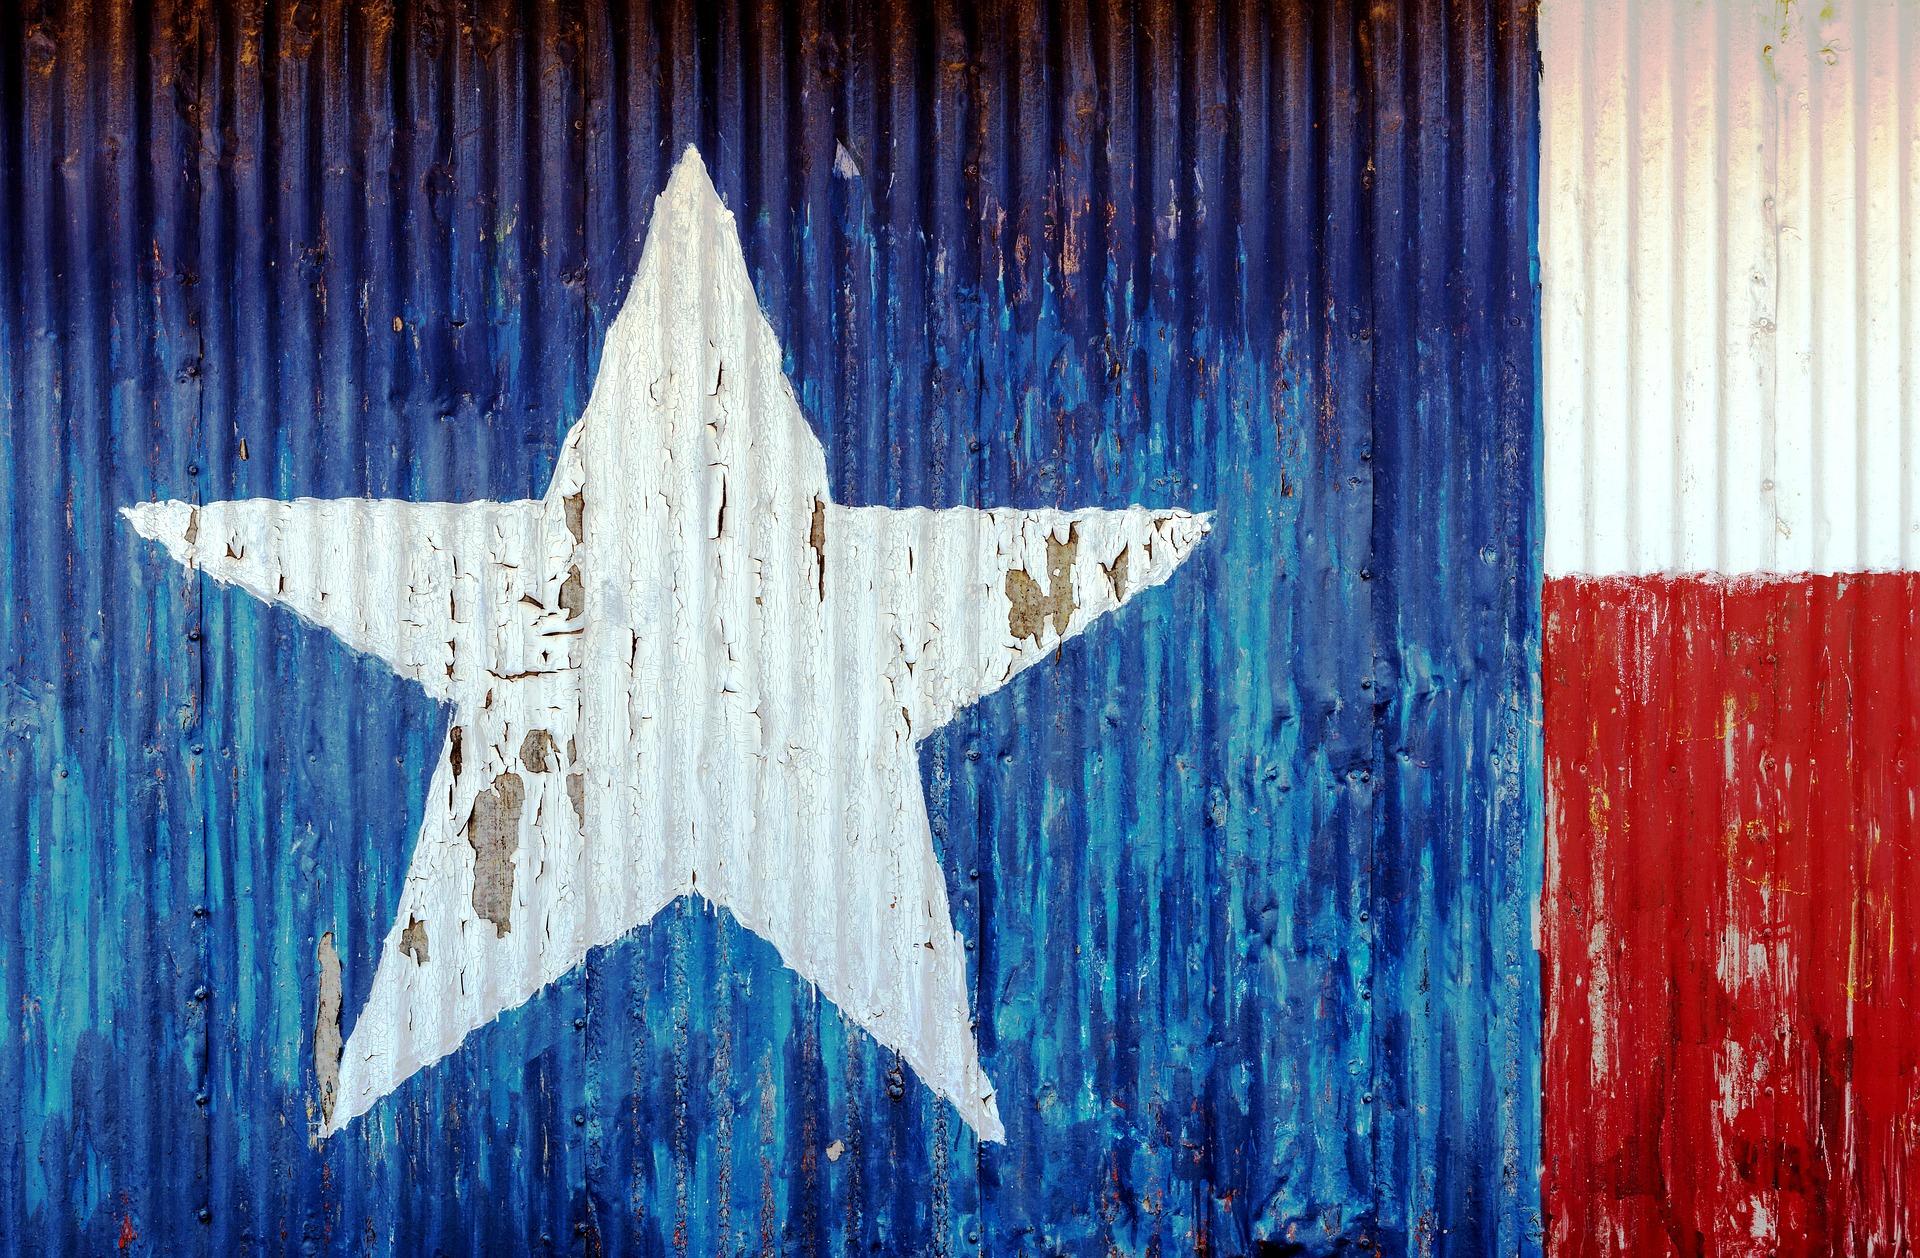 texas-1656861_1920.jpg